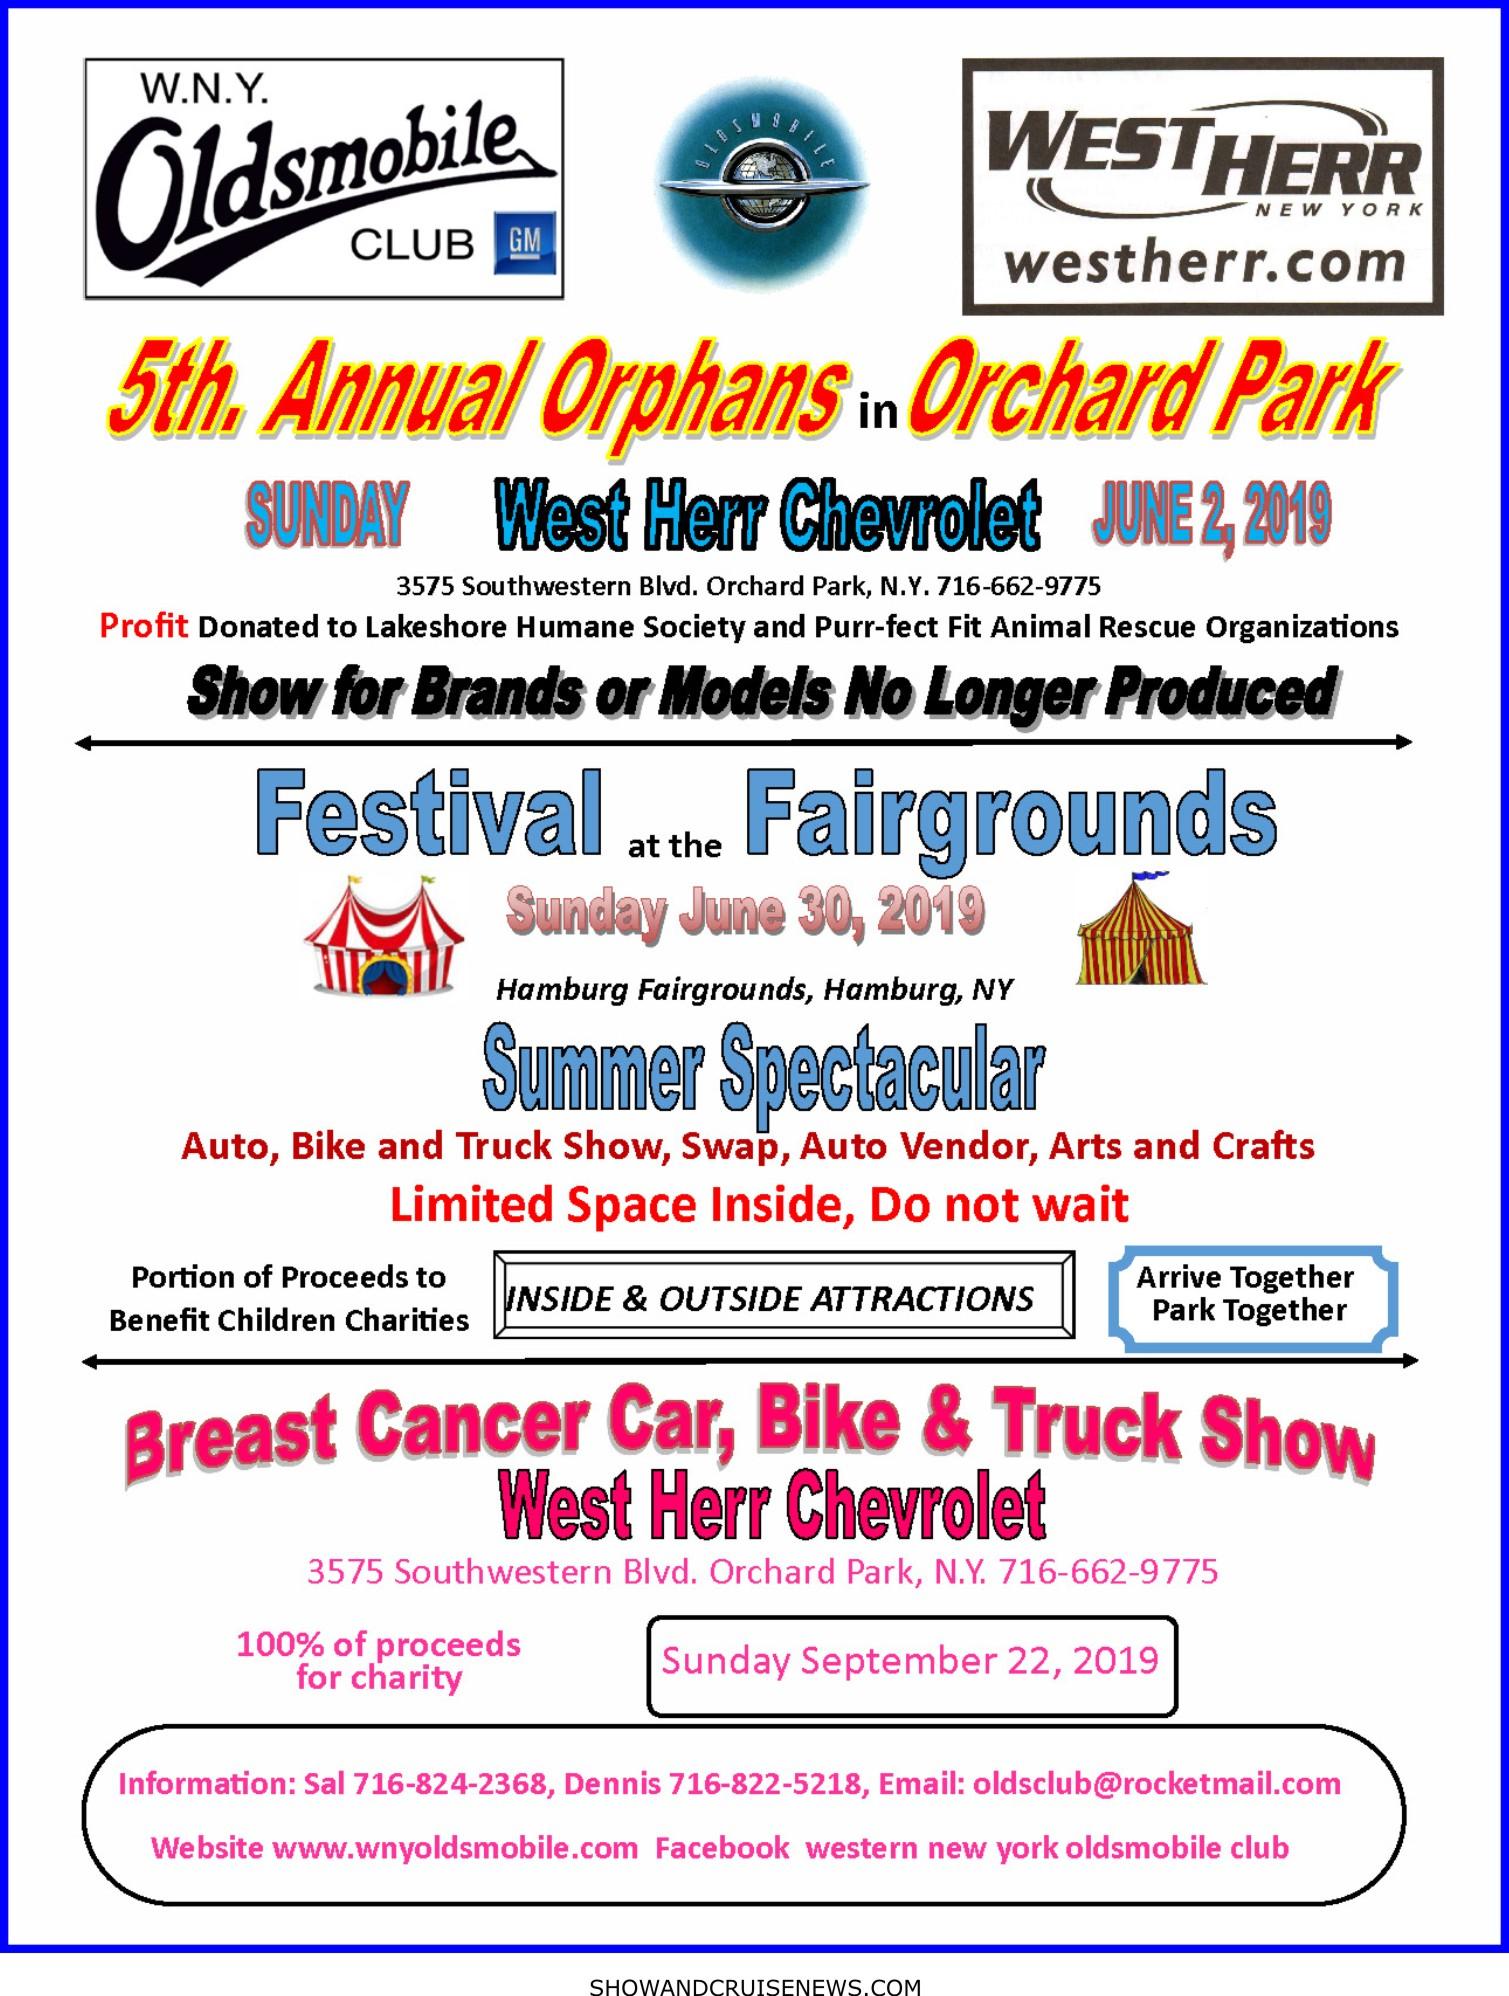 Festival At The Fairgrounds Carcruisefinder Com